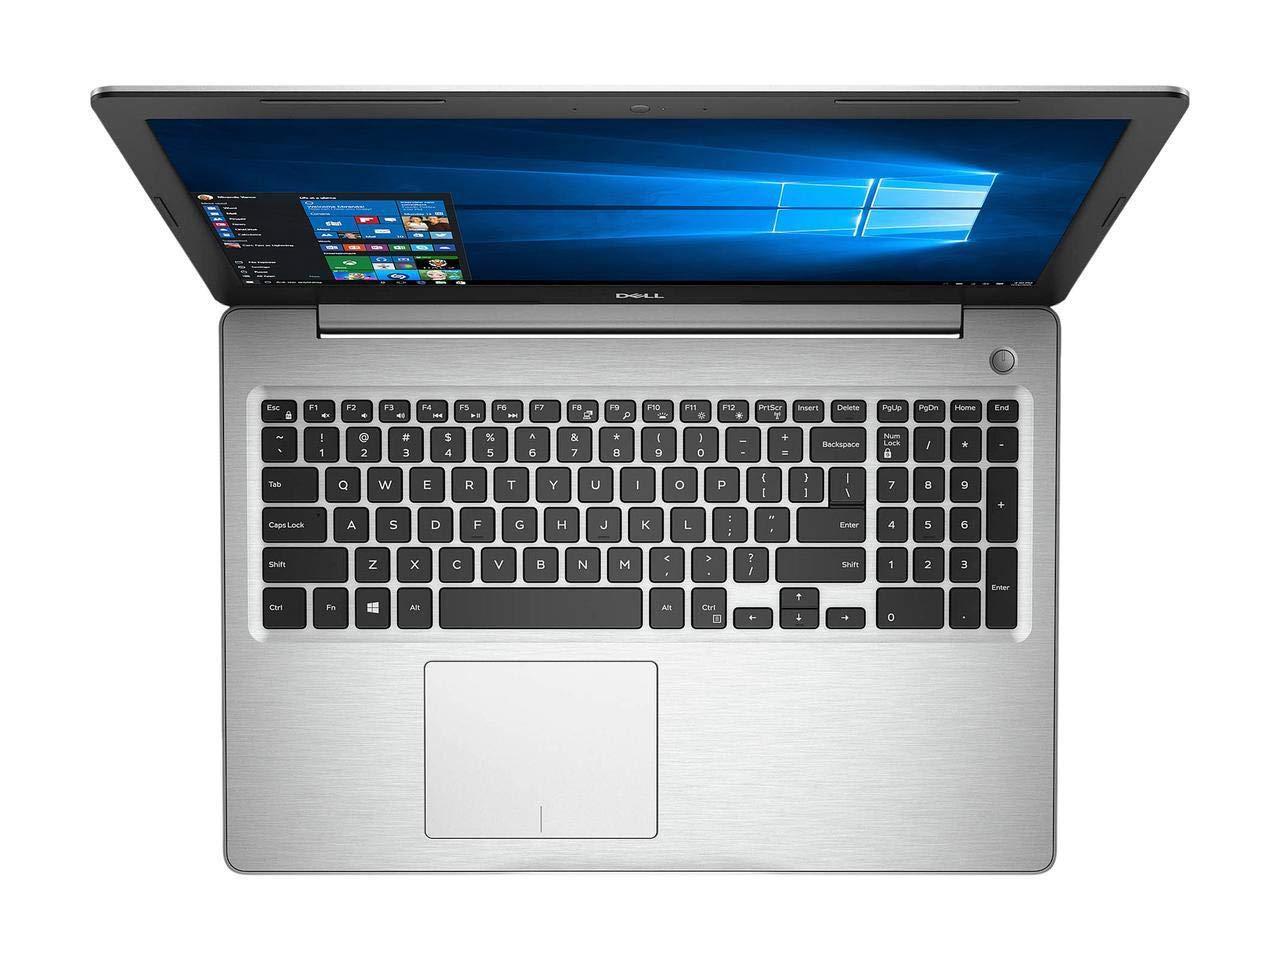 "2019 Dell Inspiron 15 5000 5570 15.6"" Full HD Touchscreen (1920x1080) Laptop (Intel Quad-Core i5-8250U, 16GB DDR4, 500GB M.2 SSD+1TB HDD) HDMI, 802.11 AC WiFi, Ethernet, Bluetooth, Windows 10 1"